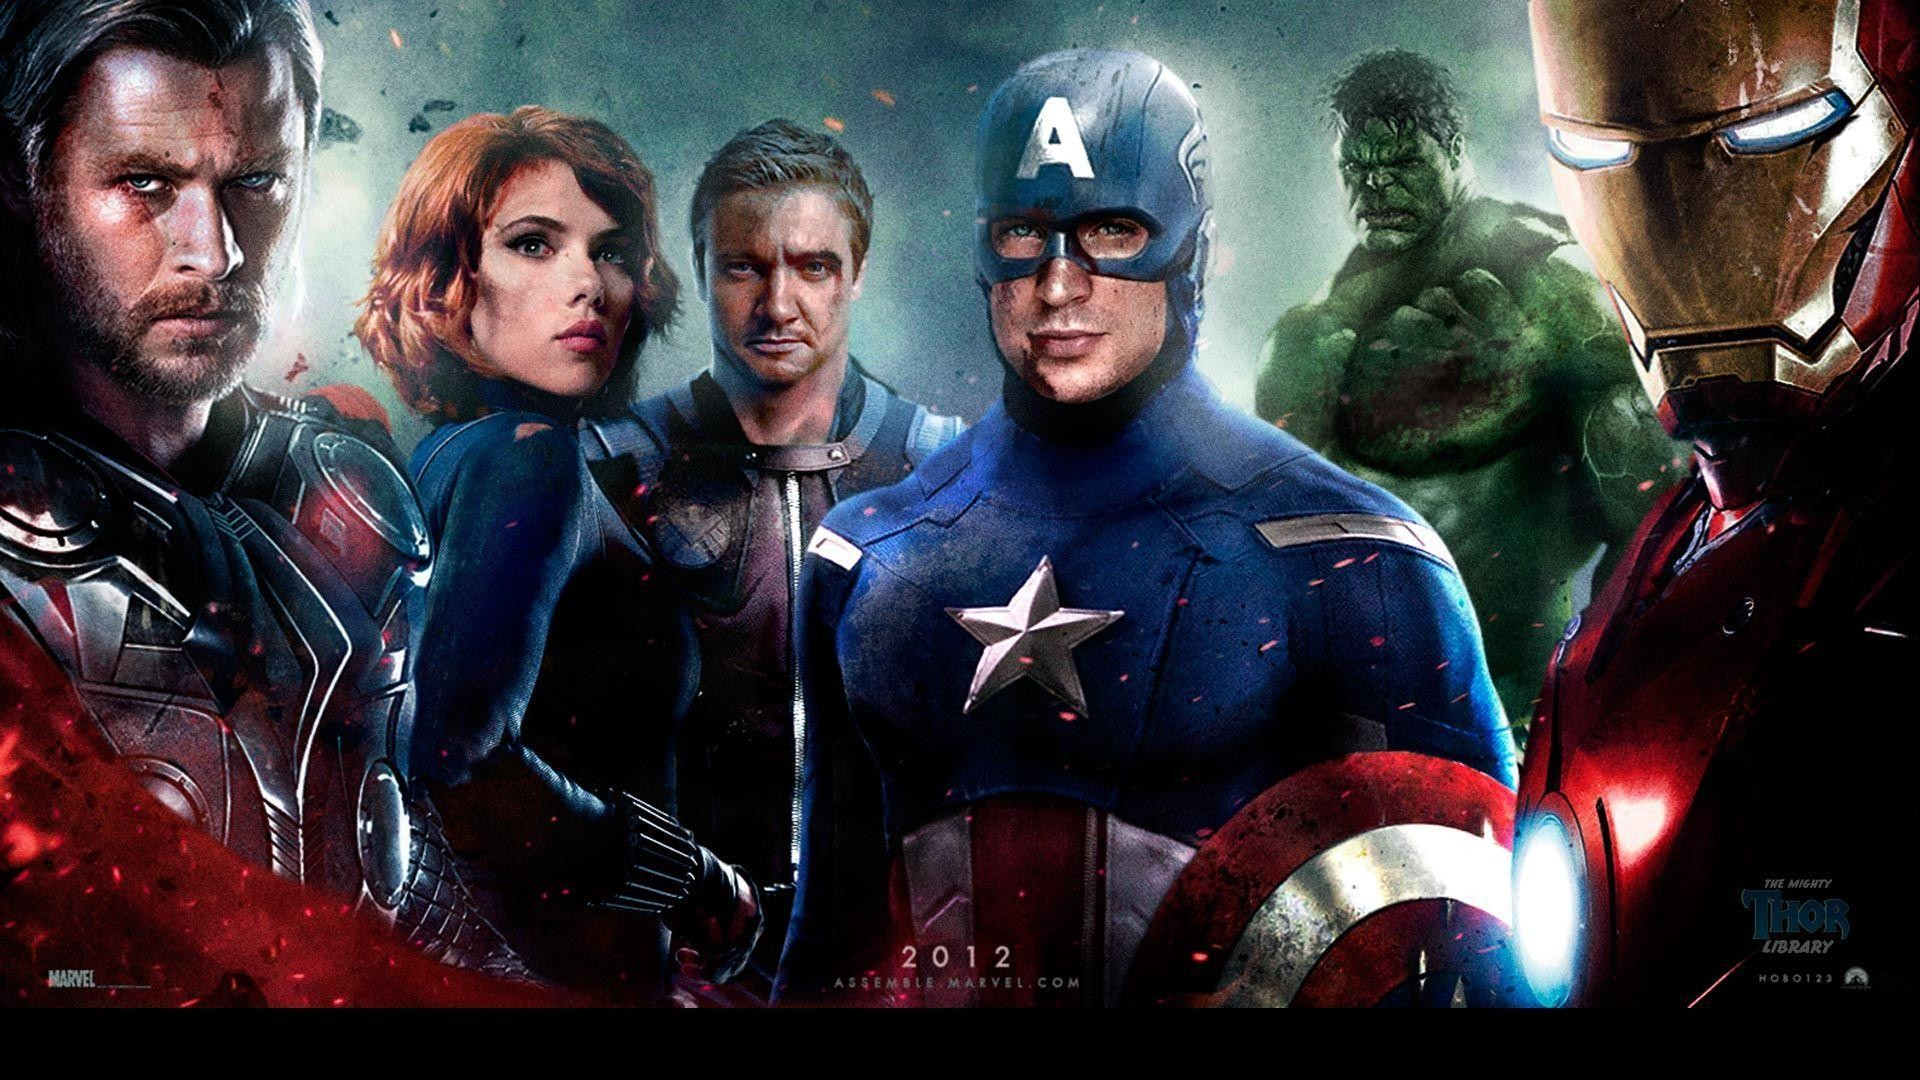 Avengers Hd Wallpaper | Superhero Wallpapers